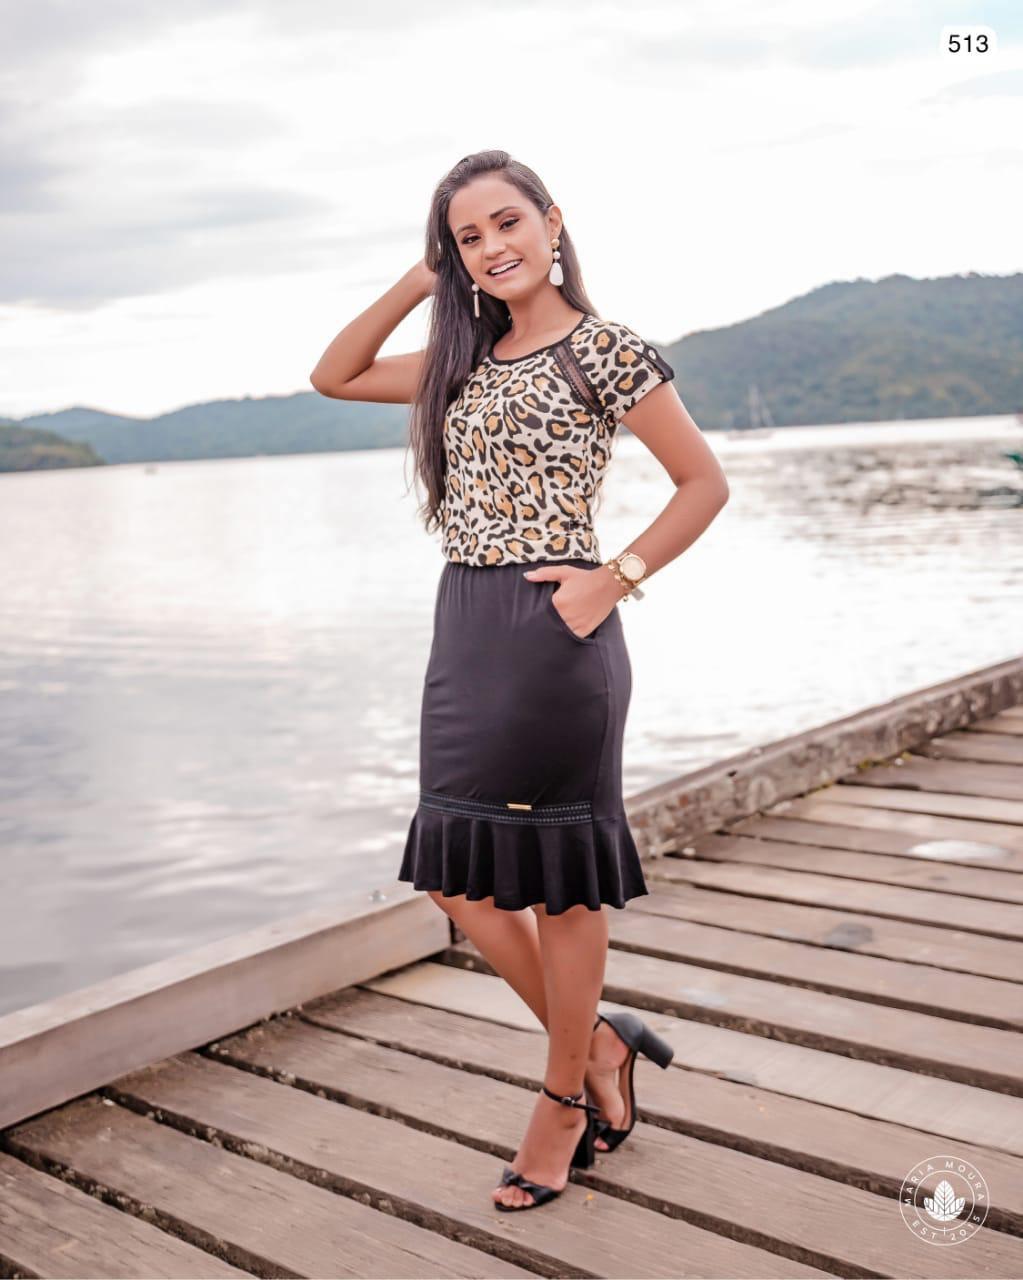 VESTIDO BLUSÊ ANIMAL PRINT SINO - MARIA MOURA